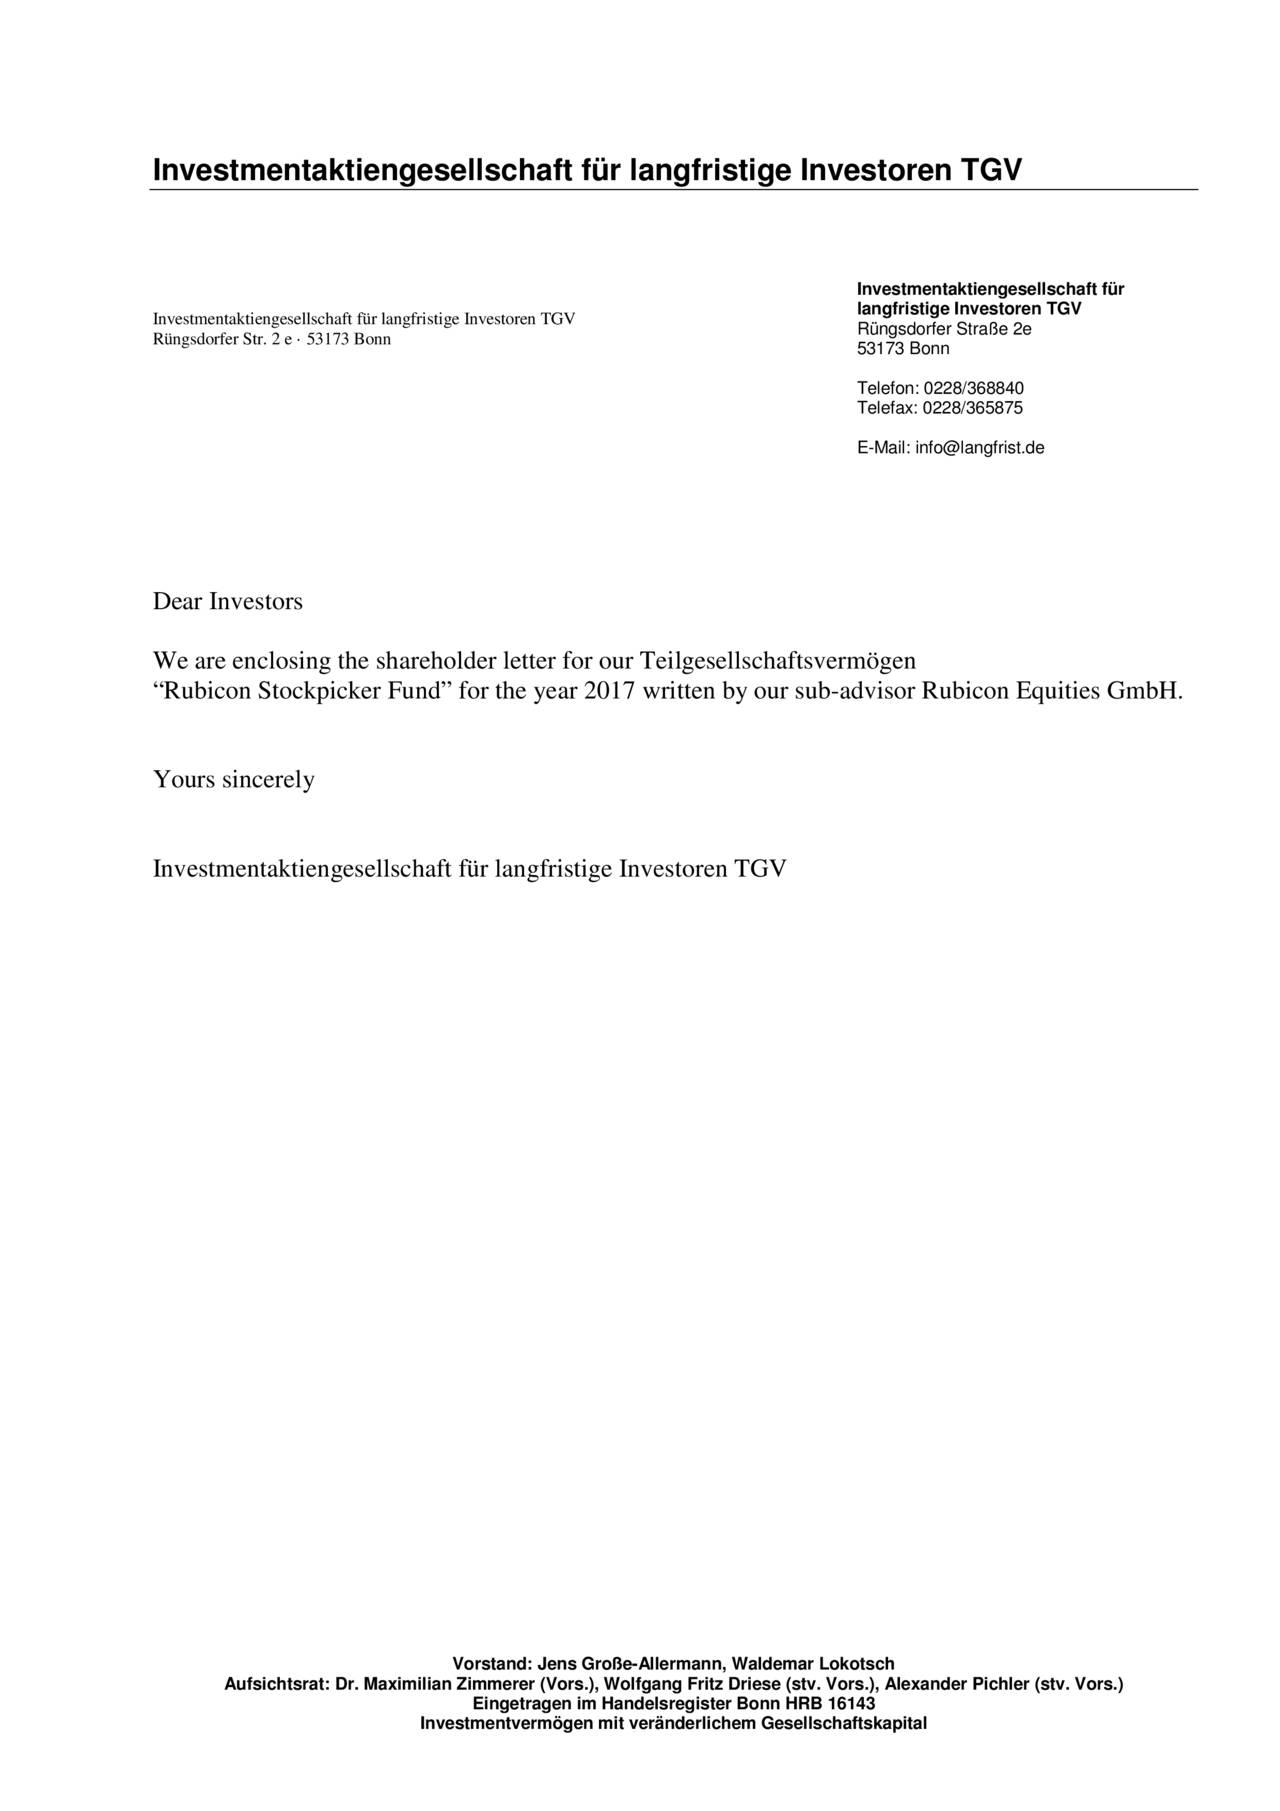 "Investmentaktiengesellschaft für langfristige Investoren TGV Rüngsdorfer Str. 2 e · 53173 Bonn Rüngsdorfer Straße 2e 53173 Bonn Telefon: 0228/368840 Telefax: 0228/365875 E-Mail: info@langfrist.de Dear Investors We are enclosing the shareholder letter for our Teilgesellschaftsvermögen ""Rubicon Stockpicker Fund"" for the year 2017 written by our sub-advisor Rubicon Equities GmbH. Yours sincerely Vorstand: Jens Große-Allermann, Waldemar Lokotsch Aufsichtsrat: Dr. Maximilian Zimmerer (Vors.), Wolfgang Fritz Driese (stv. Vors.), Alexander Pichler (stv. Vors.) Eingetragen im Handelsregister Bonn HRB 16143 Investmentvermögen mit veränderlichem Gesellschaftskapital"